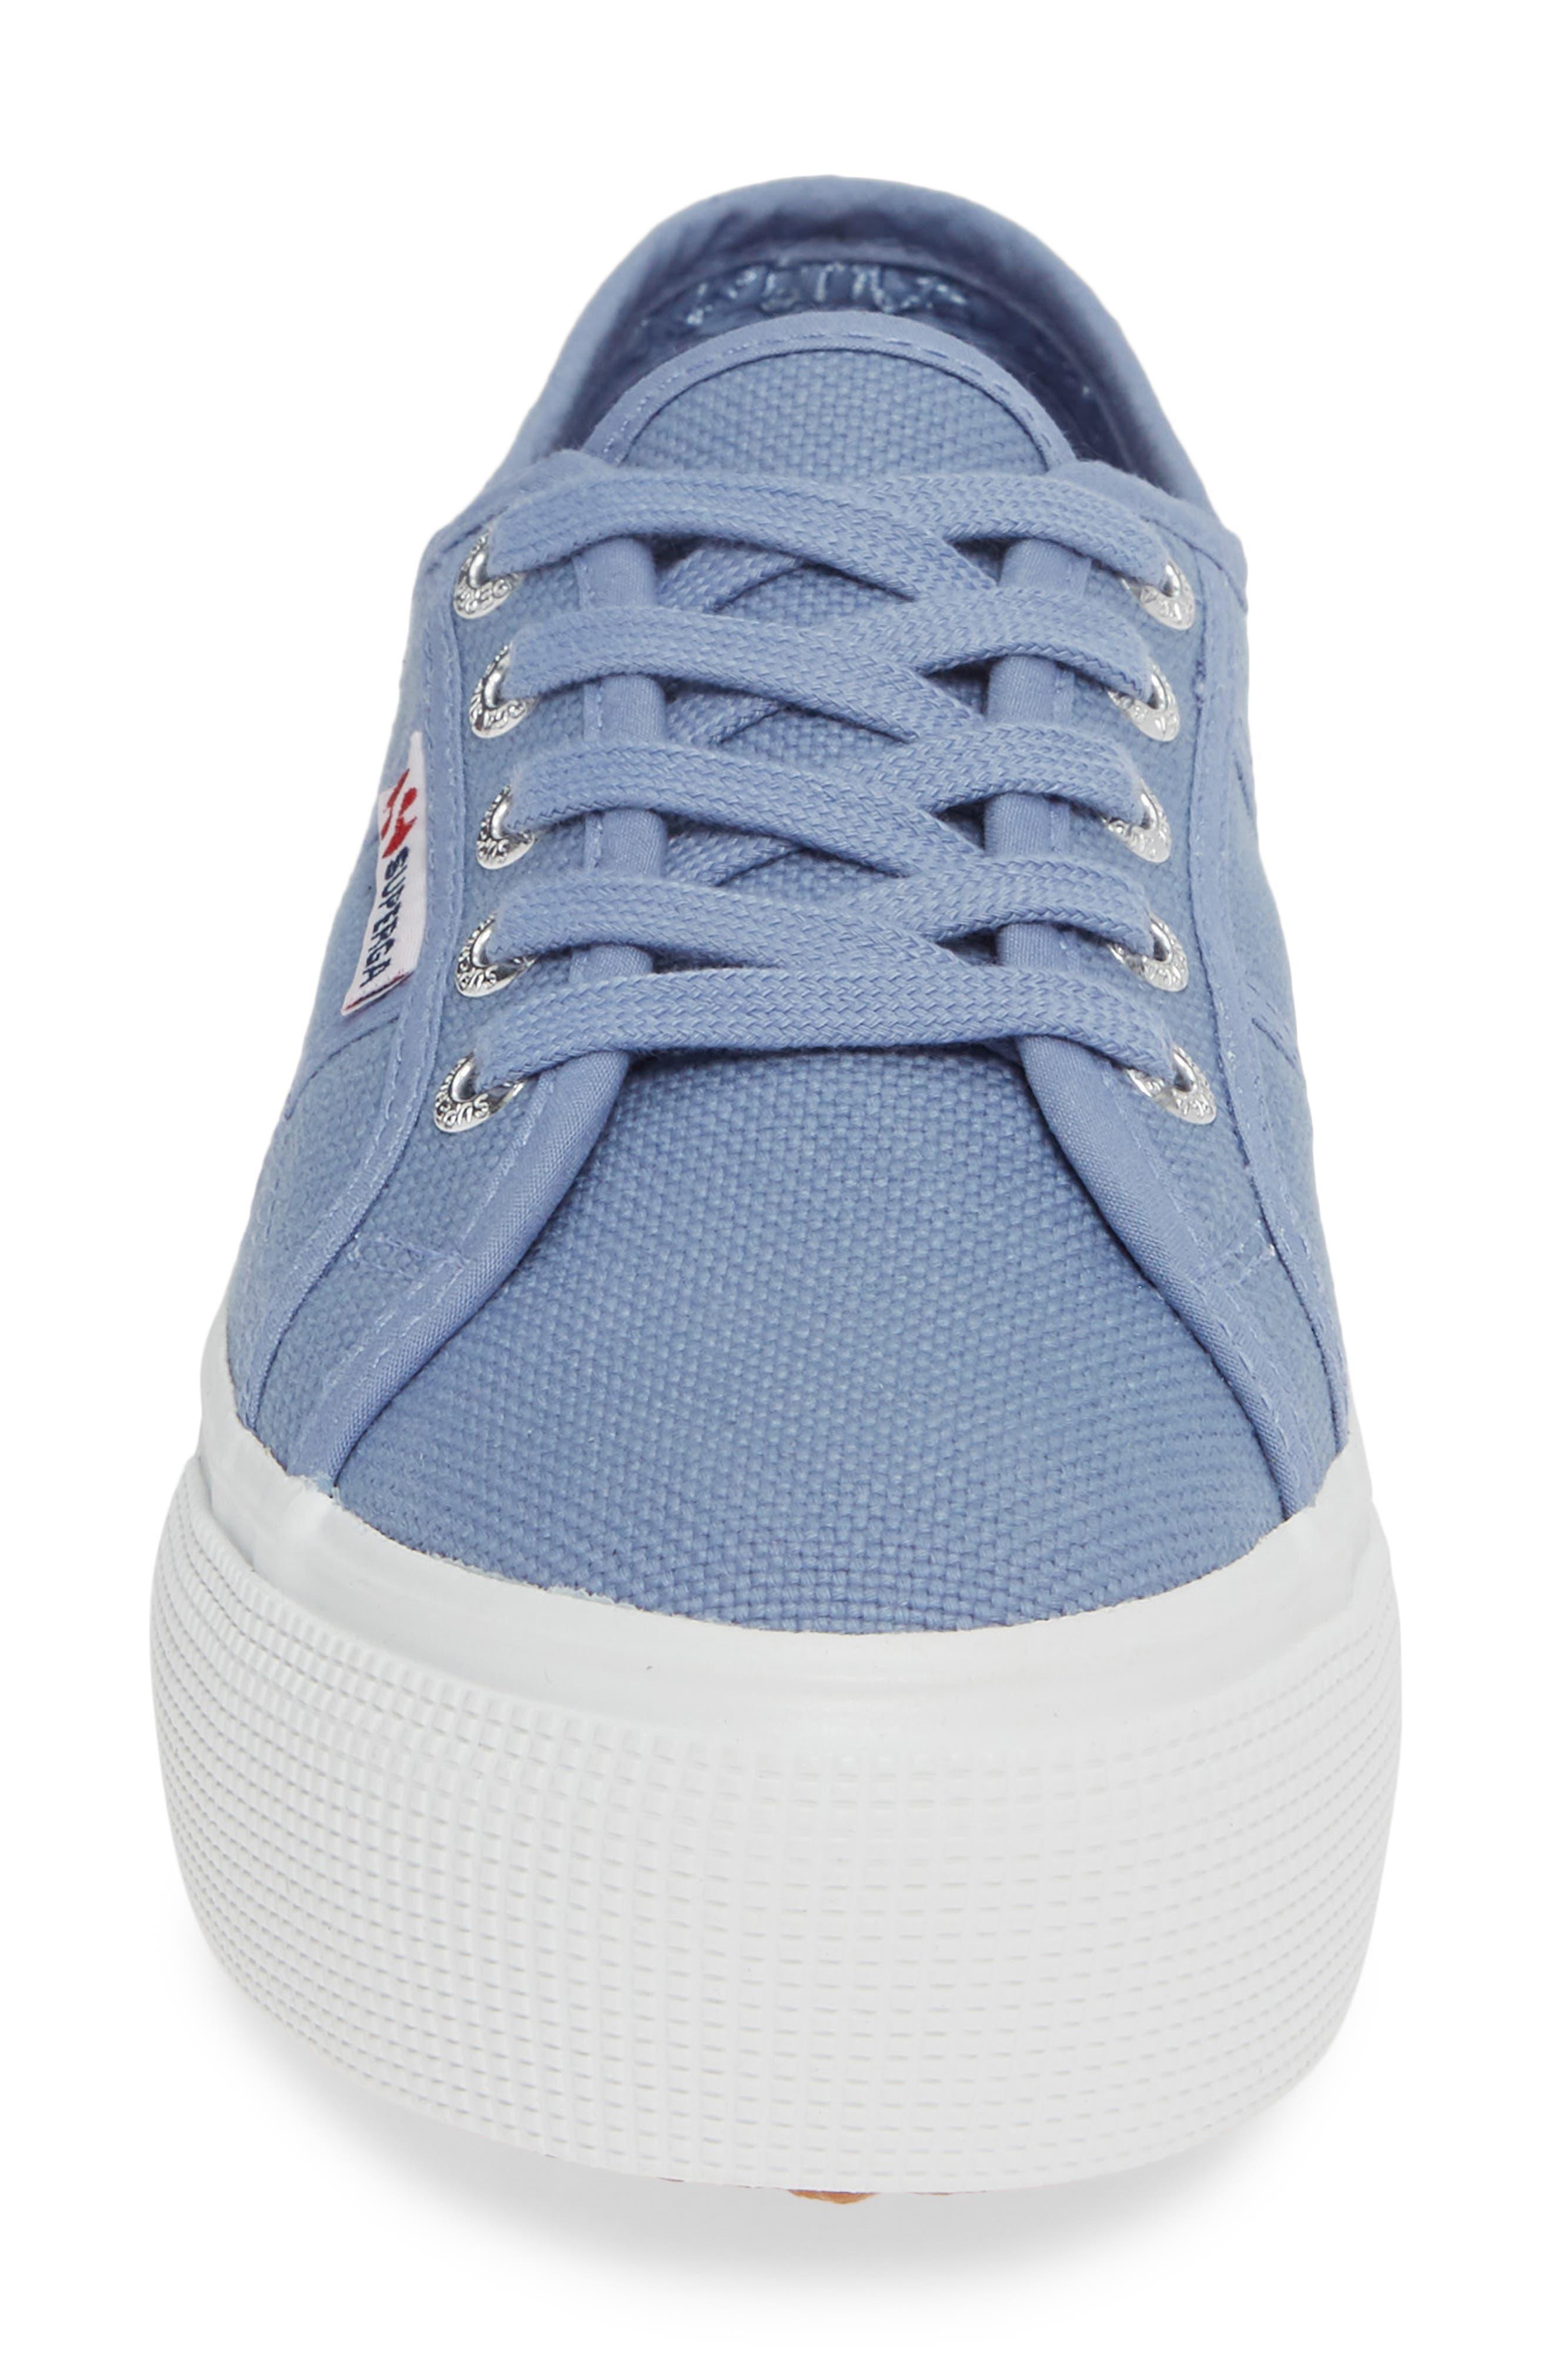 'Acot Linea' Sneaker,                             Alternate thumbnail 4, color,                             BLUE/ LIGHT PURPLE